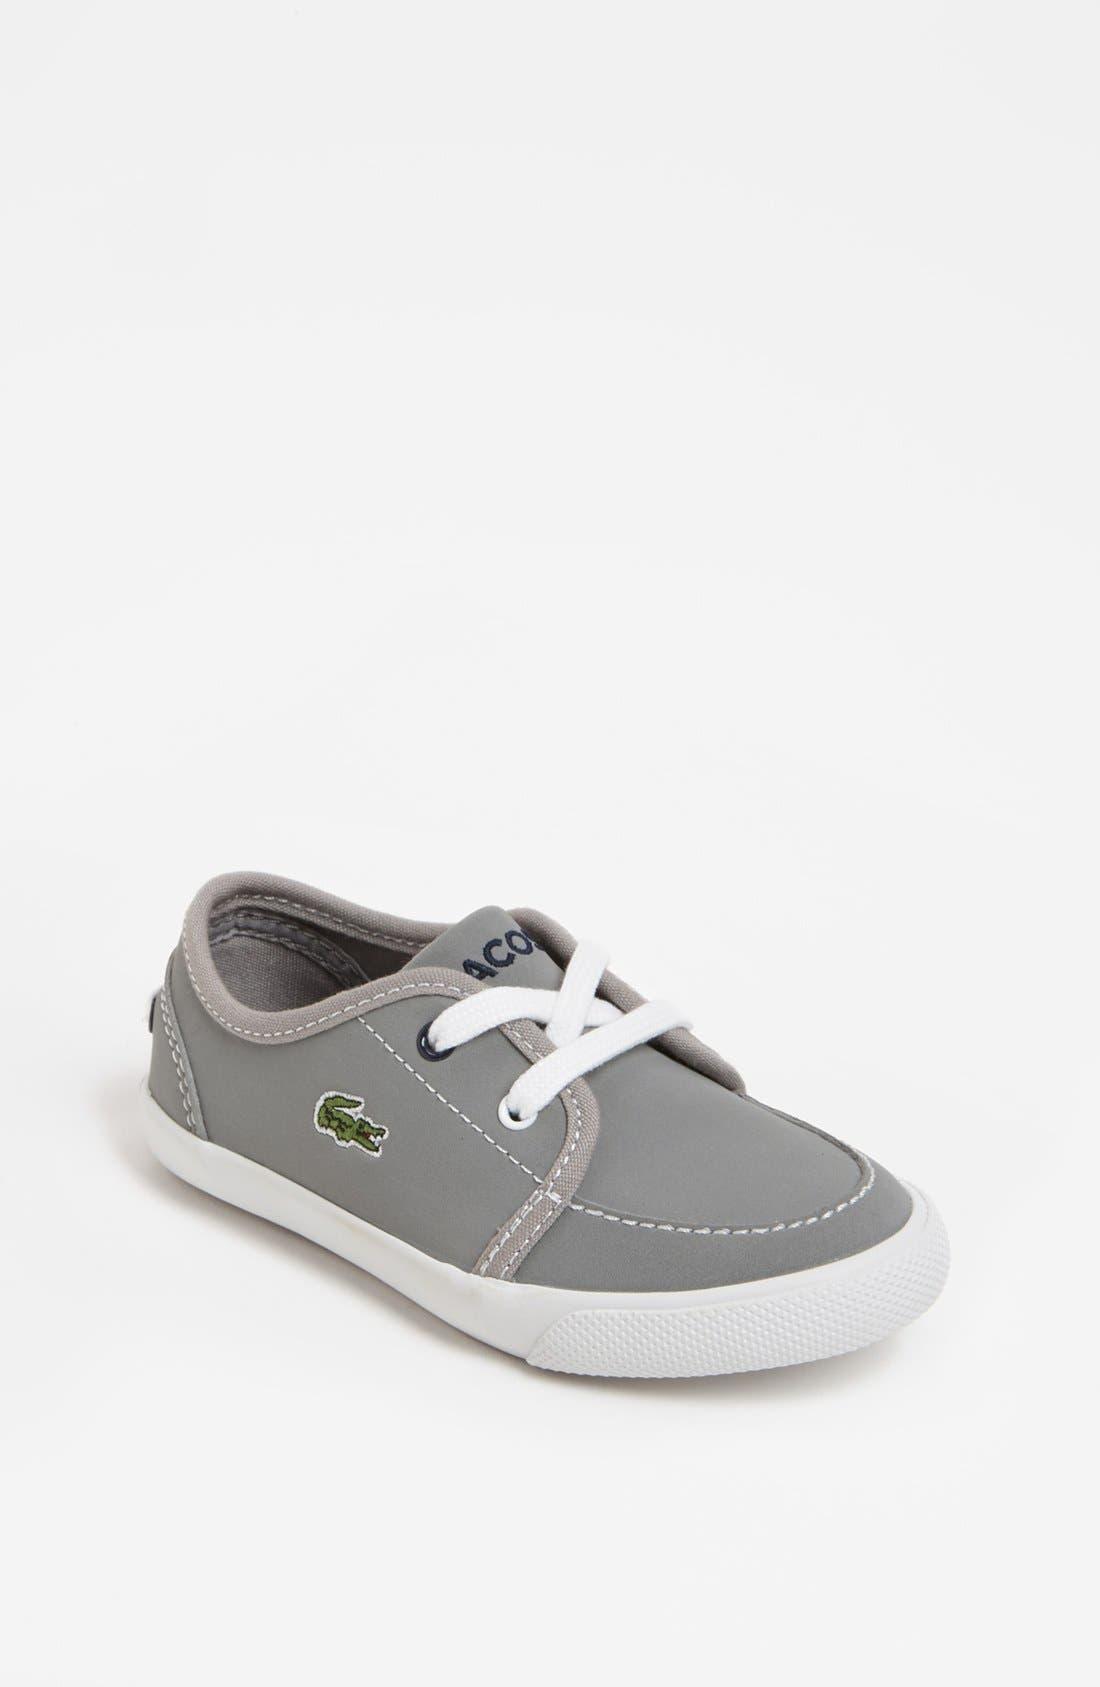 Alternate Image 1 Selected - Lacoste 'Boat DE' Sneaker (Toddler)